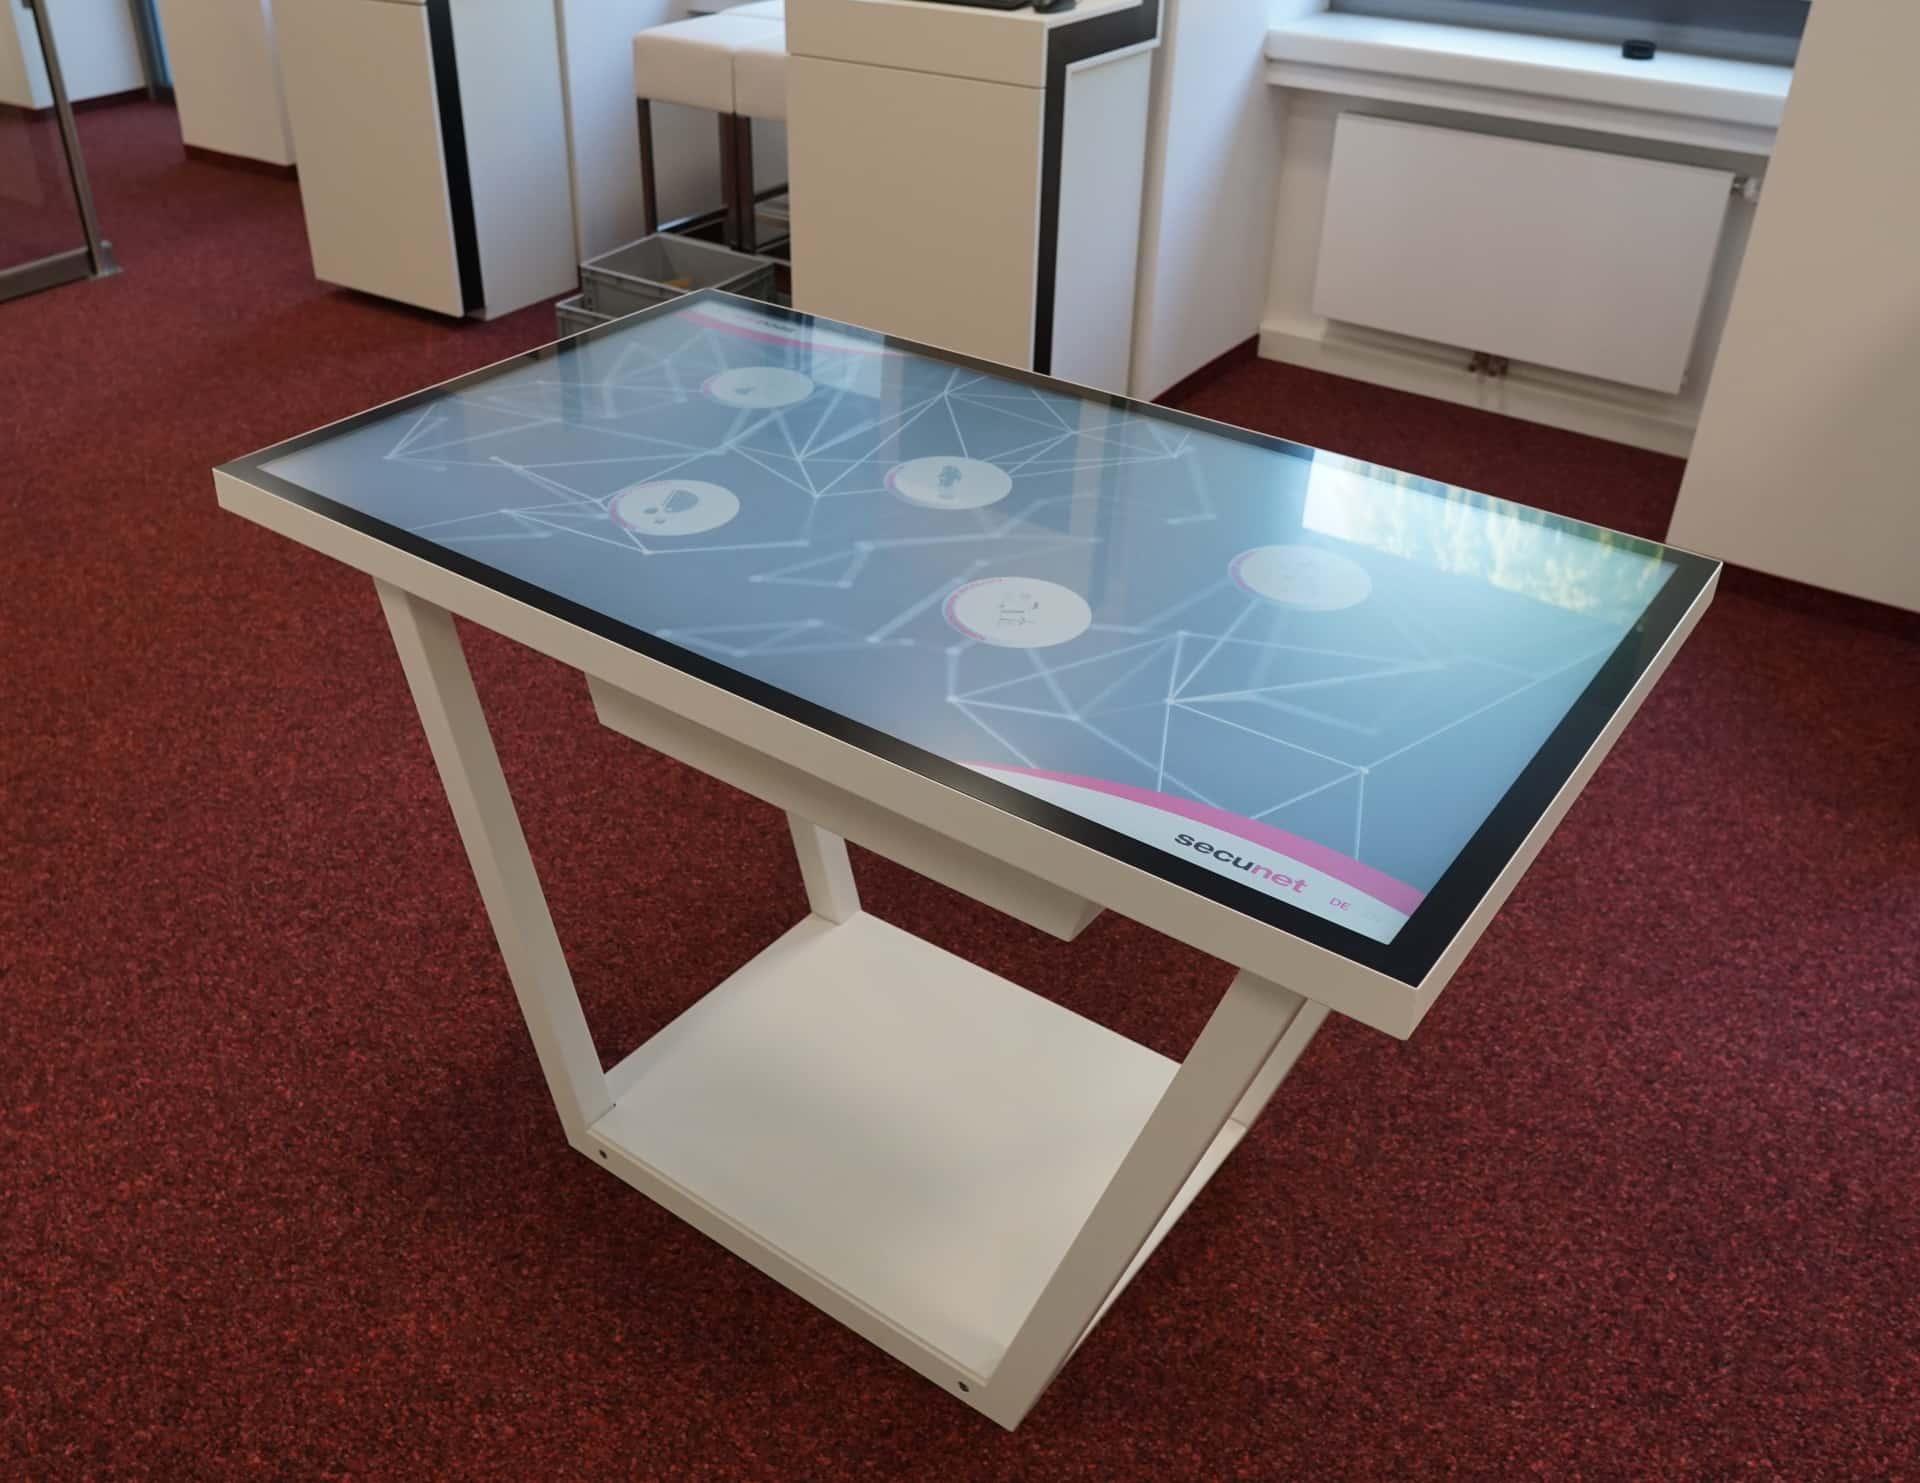 Multitouch-Tisch - Rollout planen